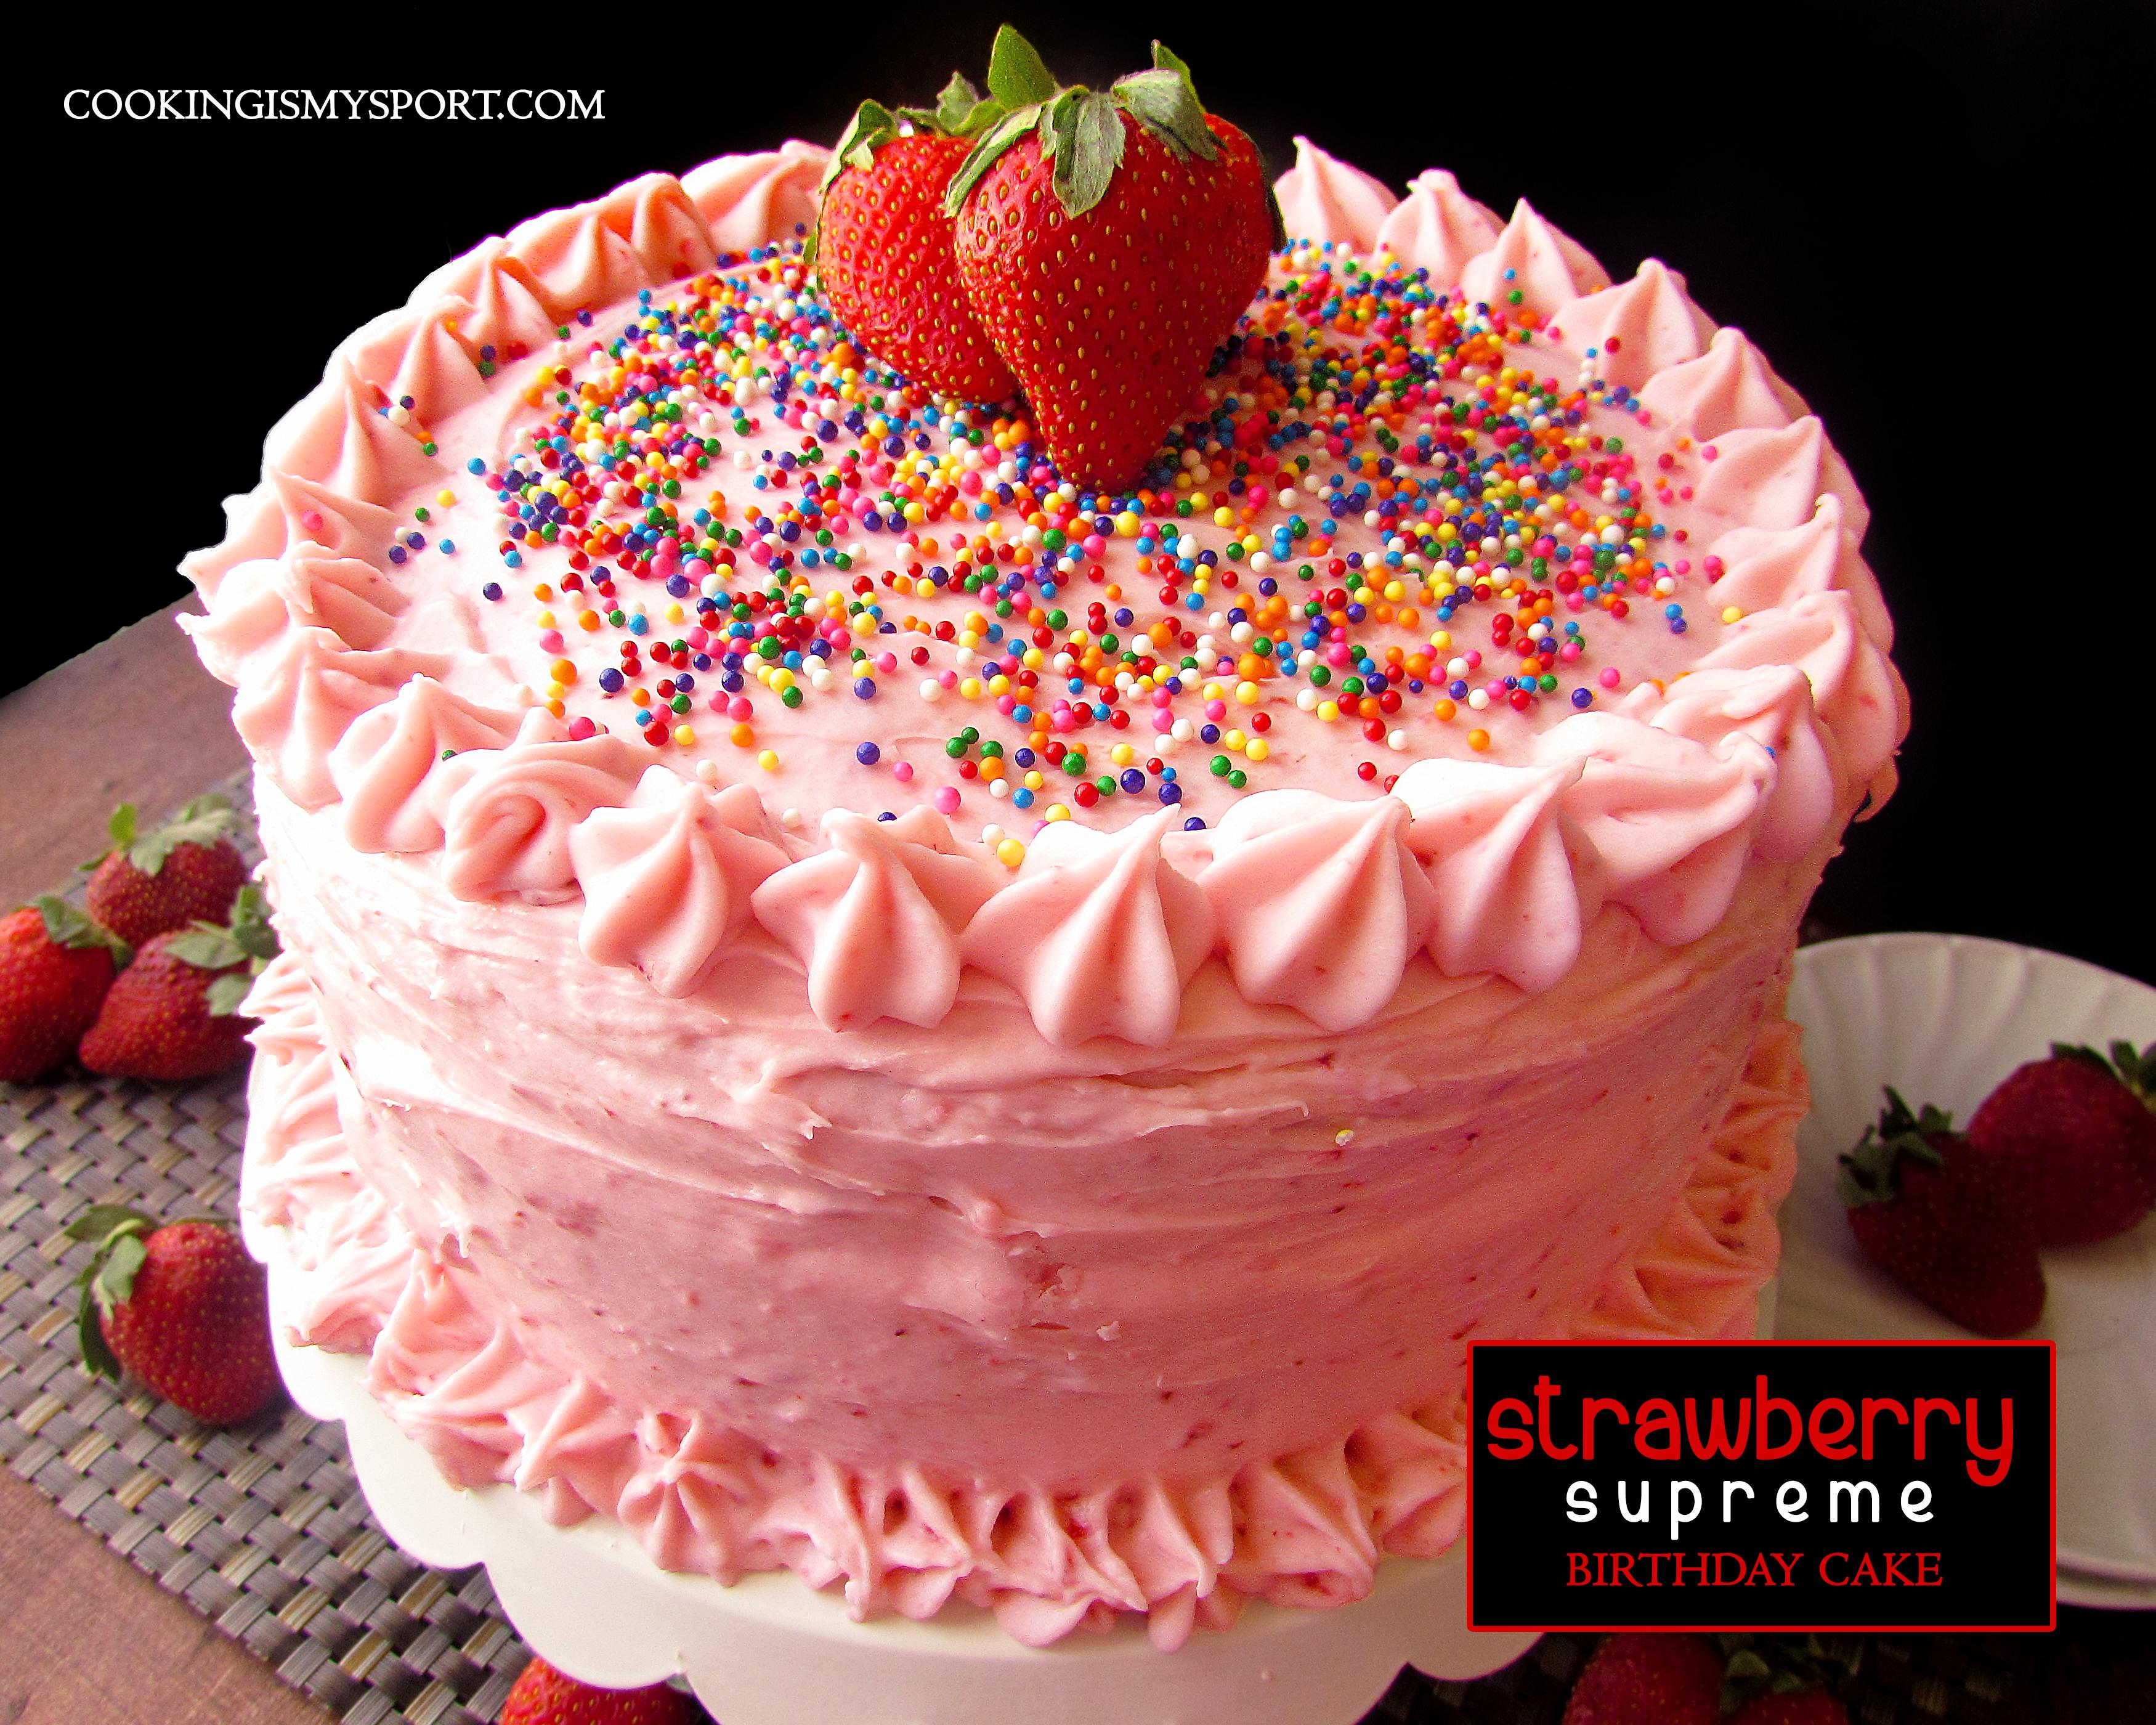 strawberry-supreme-birthday-cake2